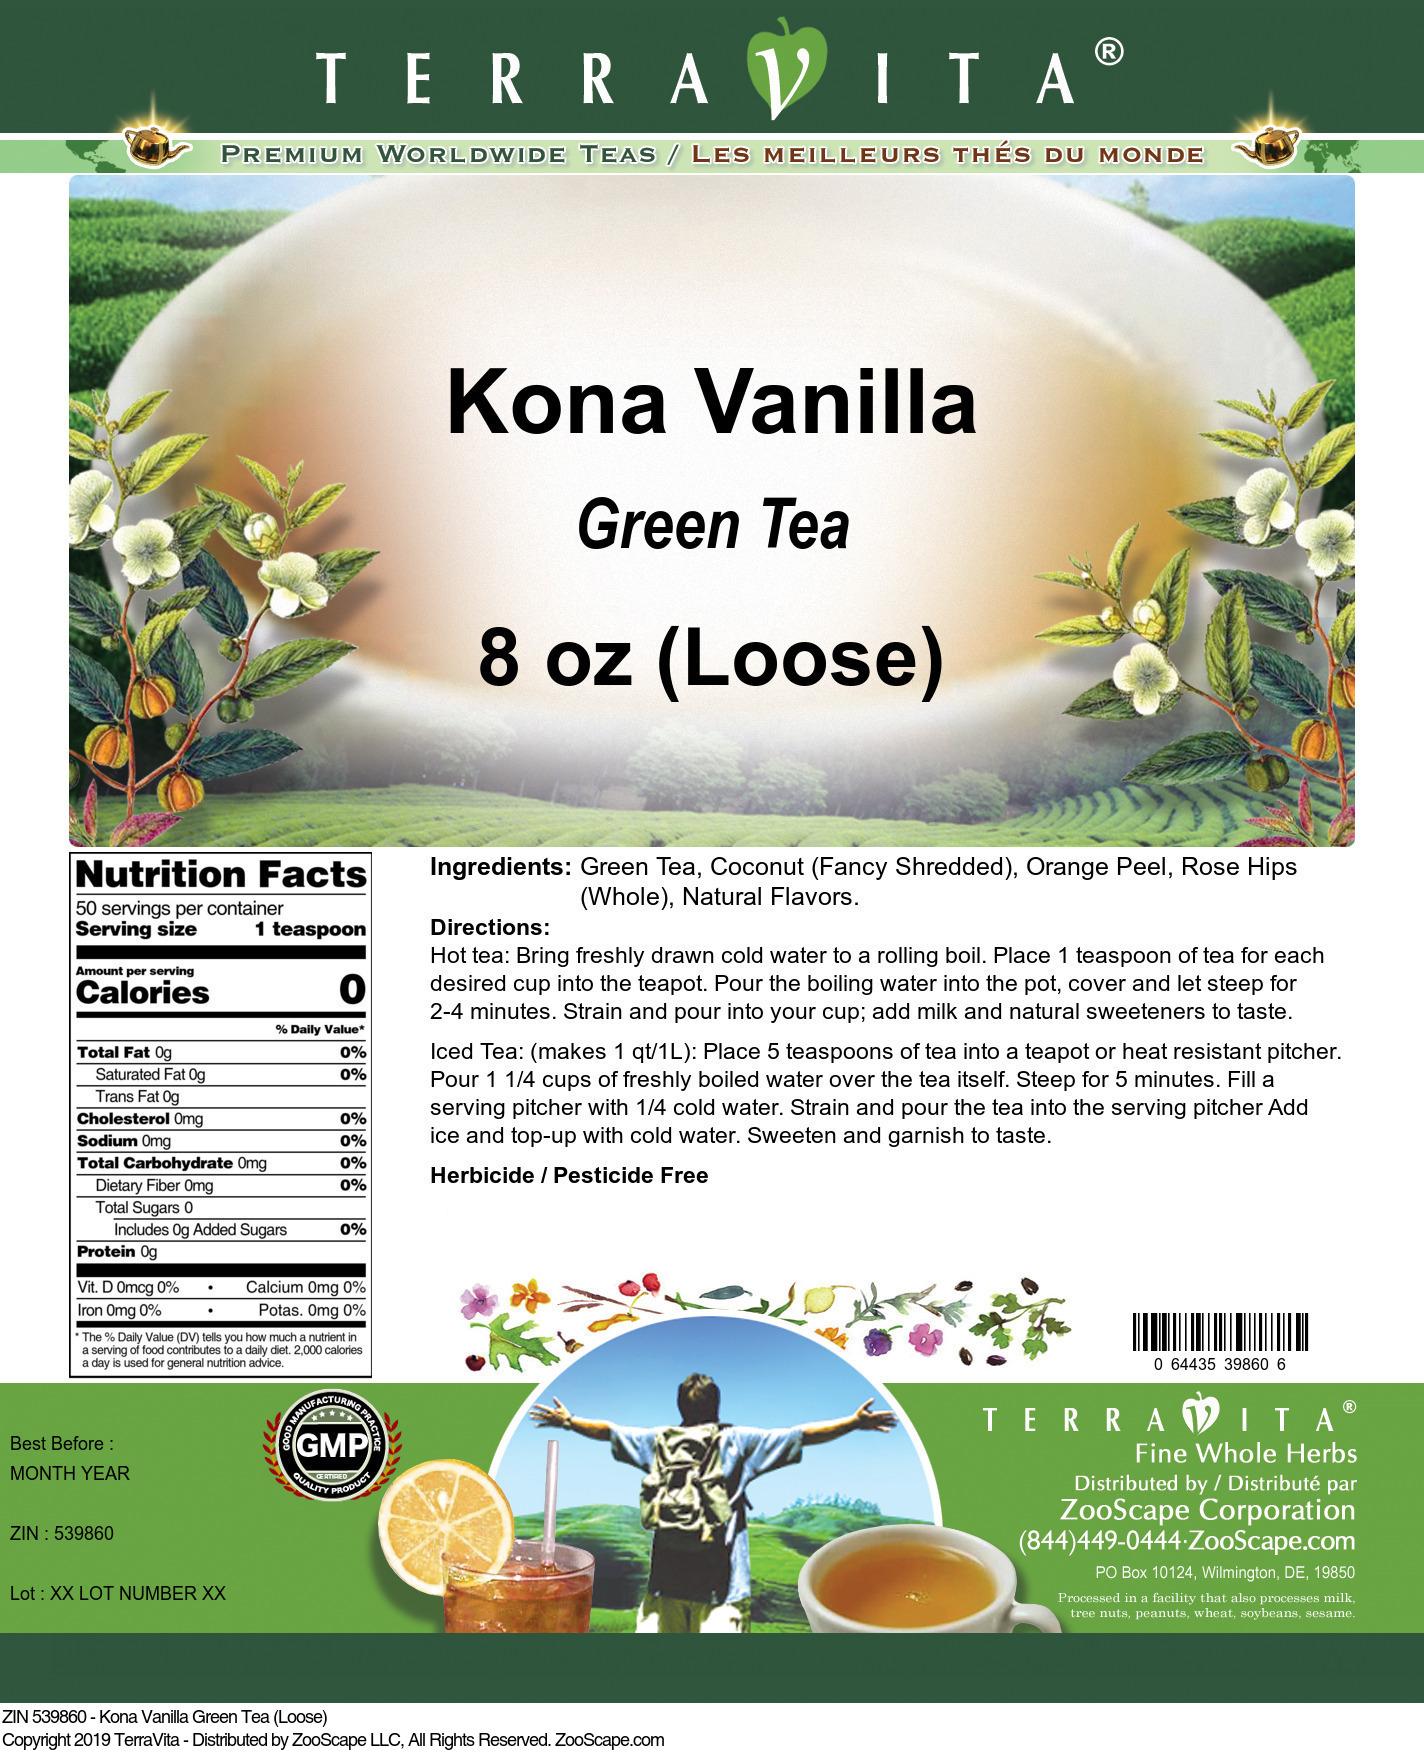 Kona Vanilla Green Tea (Loose)